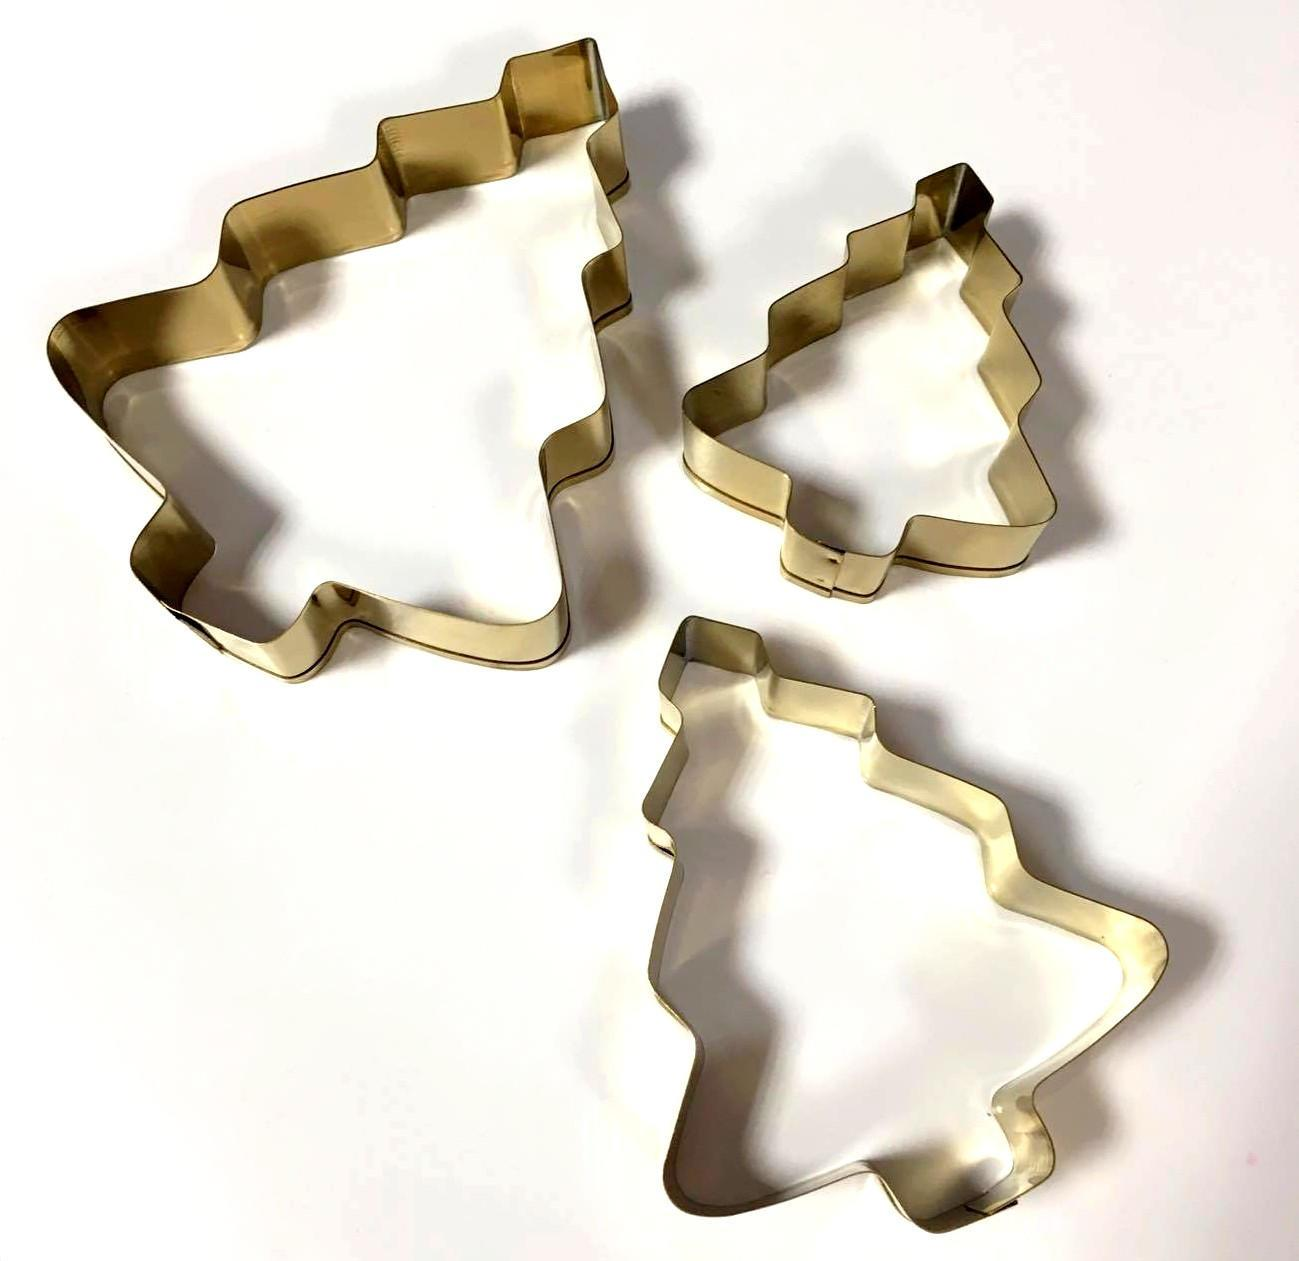 TAFELGUT Vykrajovátka Tree - set 3 ks, zlatá barva, kov